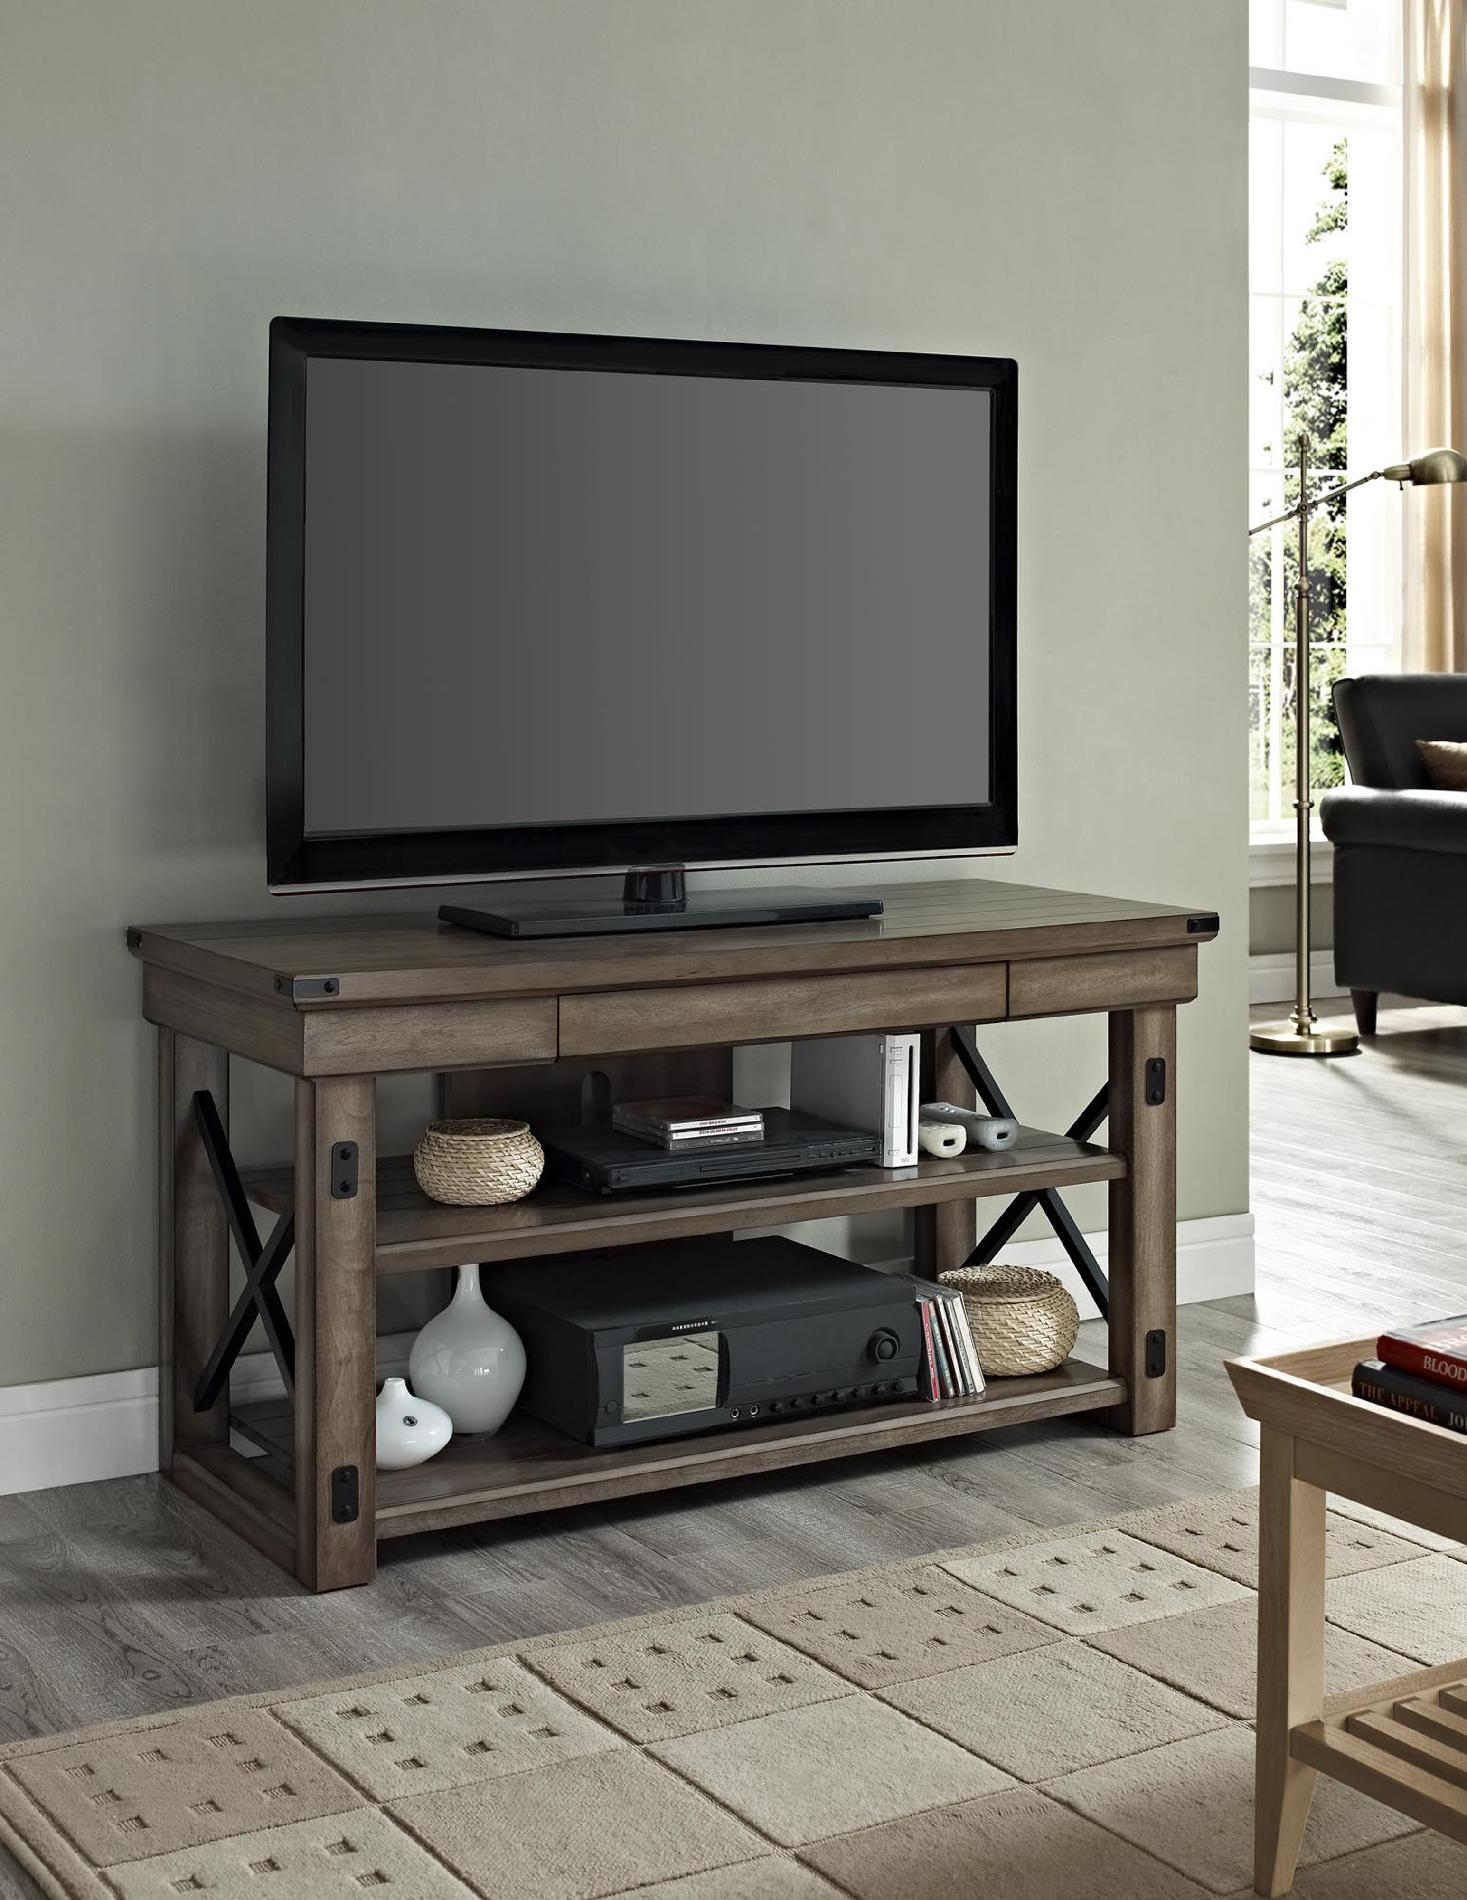 Dorel Home Furnishings Wildwood Rustic Gray TV Console